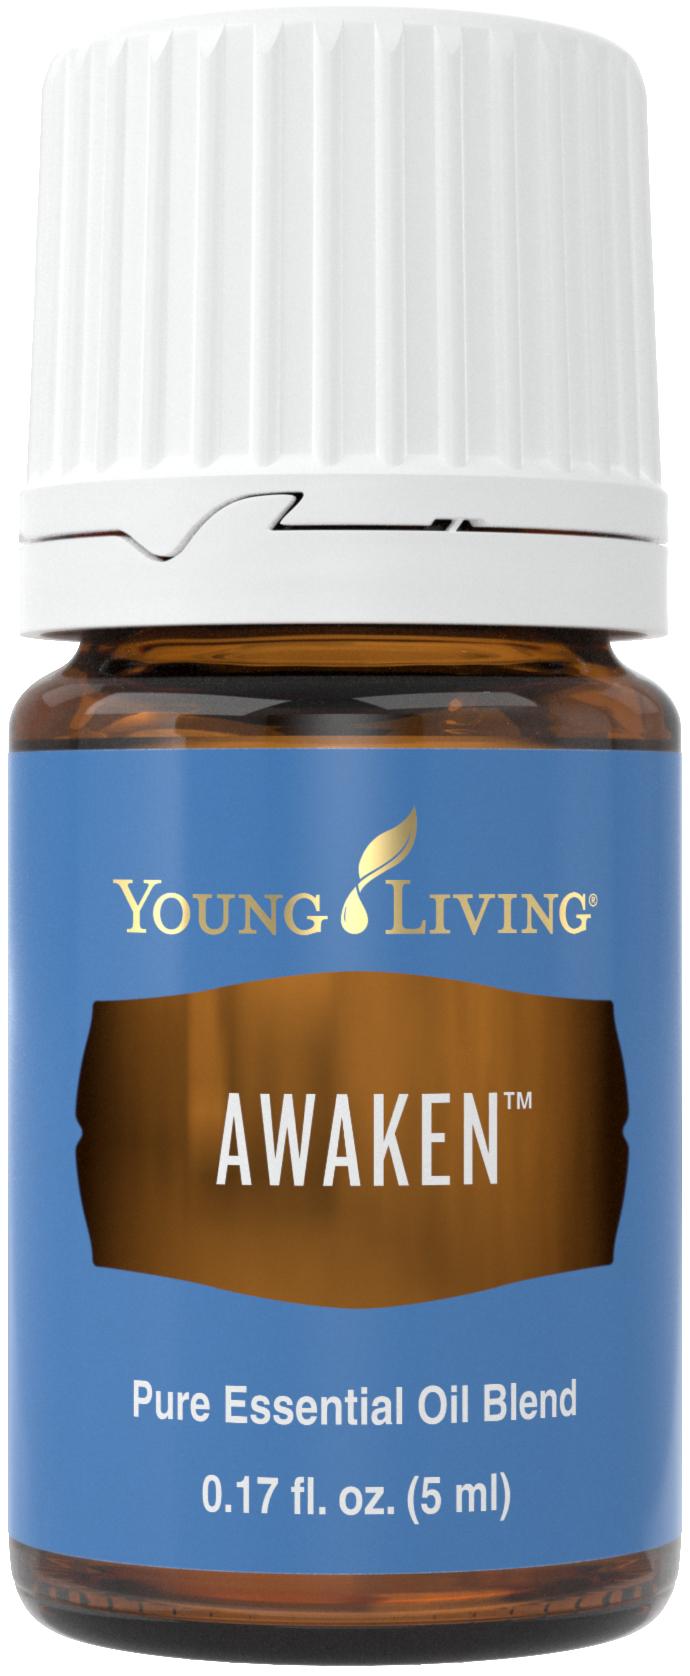 Awaken Essential Oil Blend - Young Living Essential Oils